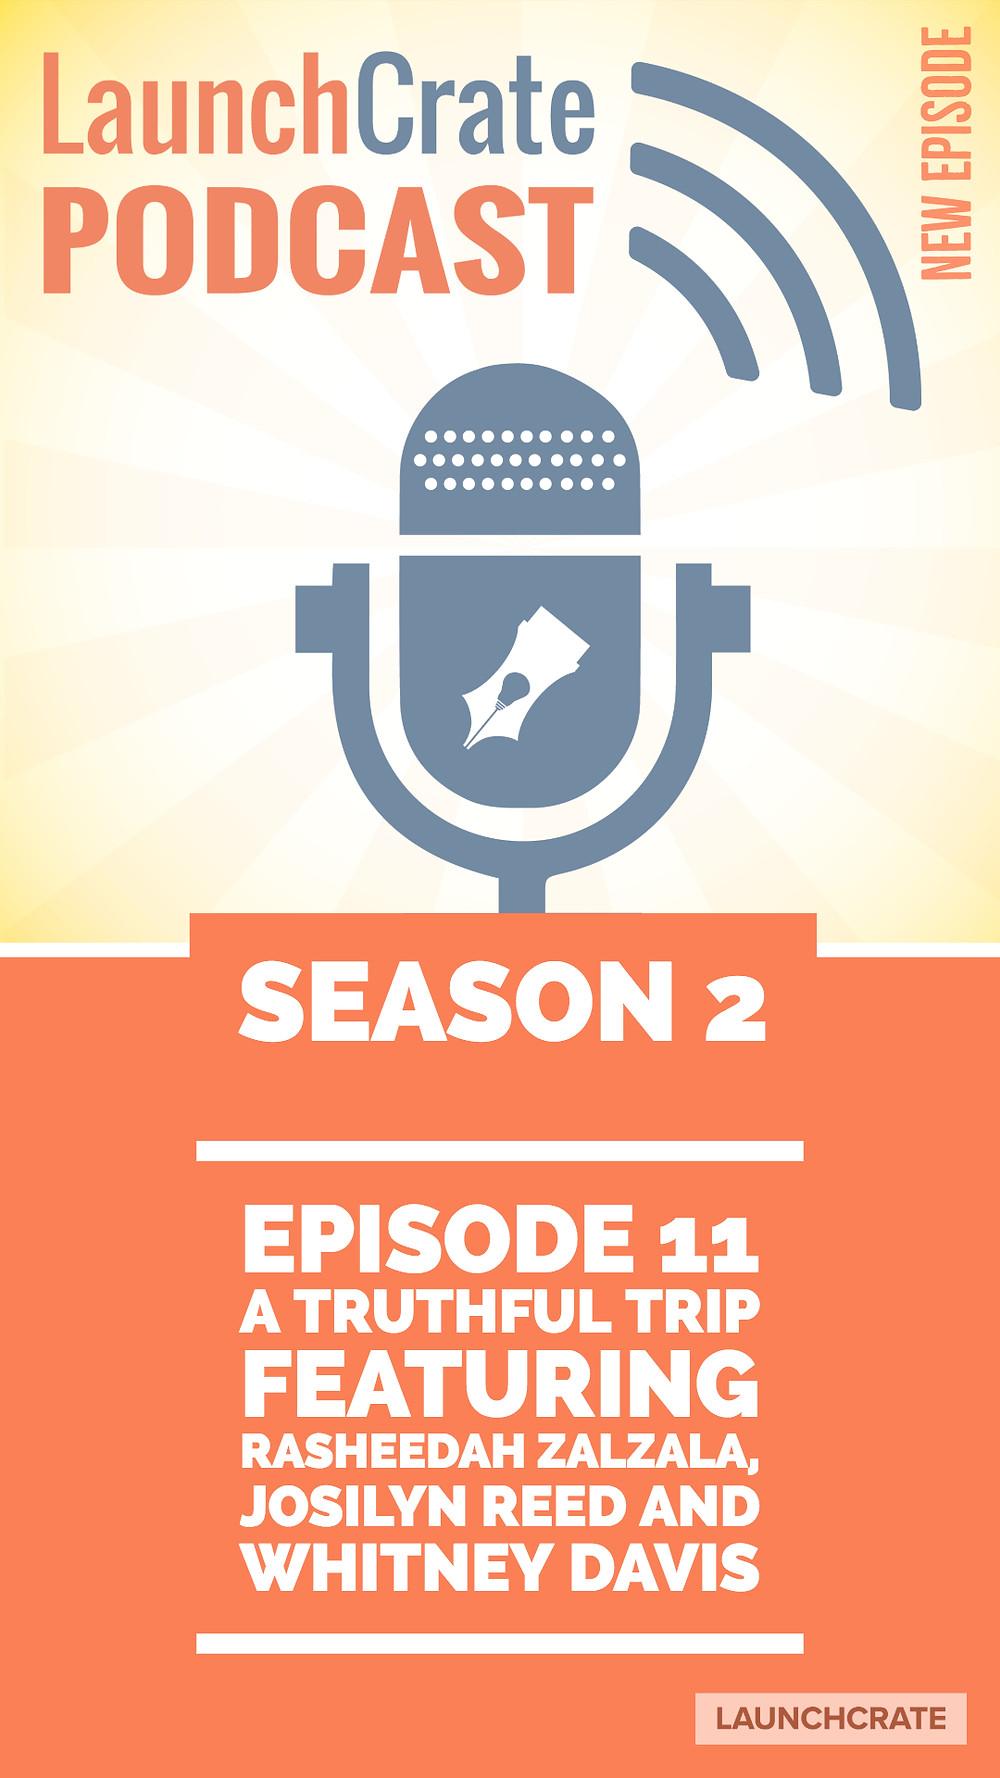 Podcast Season 2, Episode 11, with Rasheedah Zalzala, Josilyn Reed, and Whitney Davis